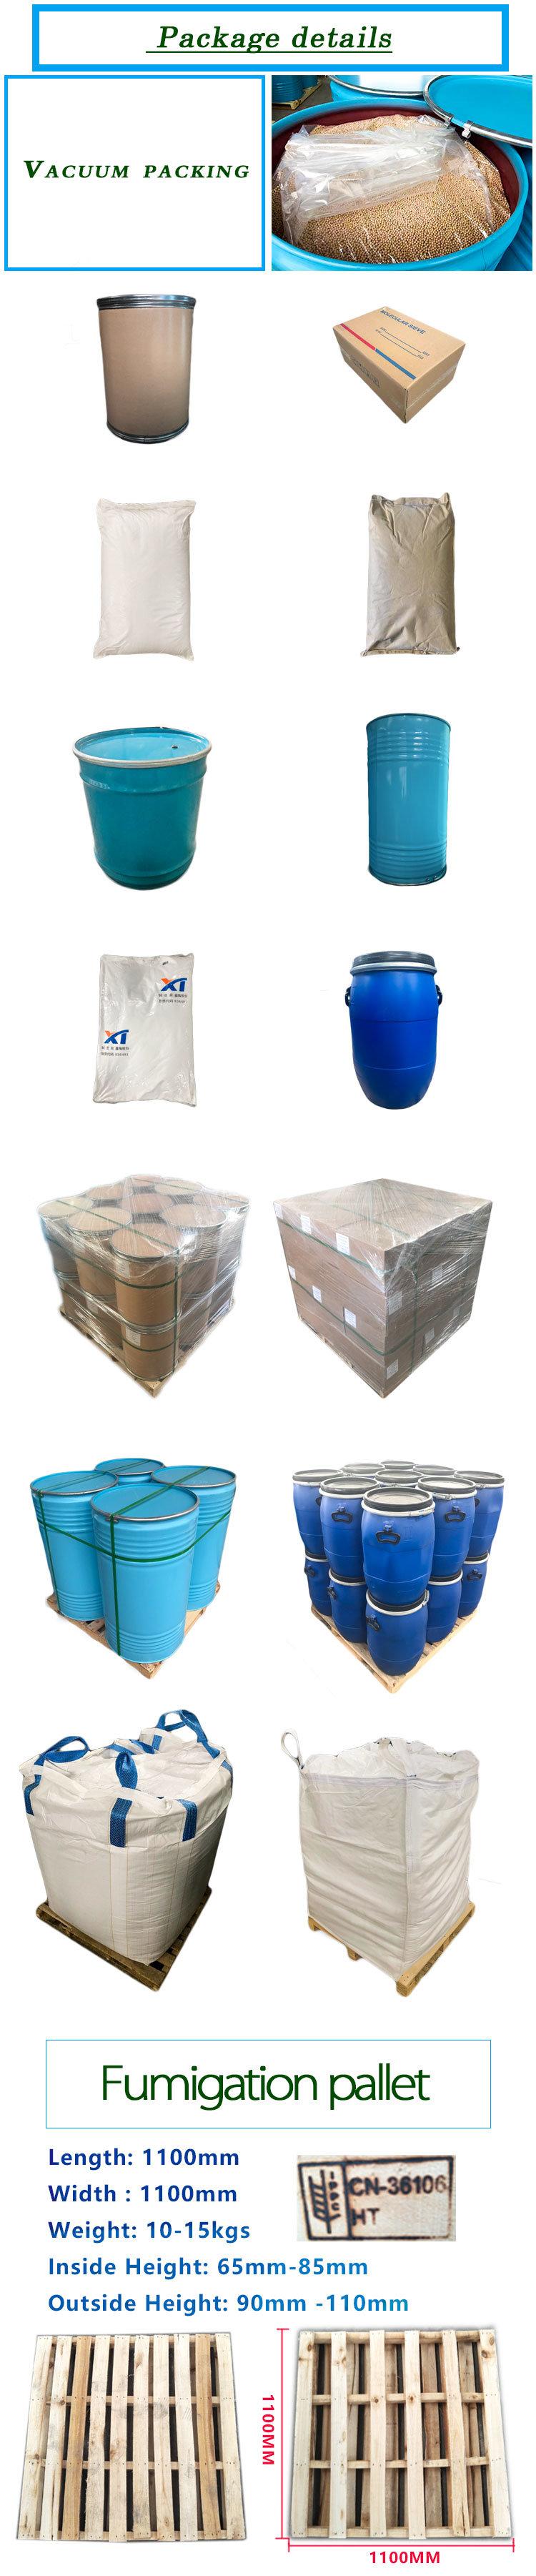 Xintao 5A Molecular Sieve Catalyst/Adsorbent/Desiccant